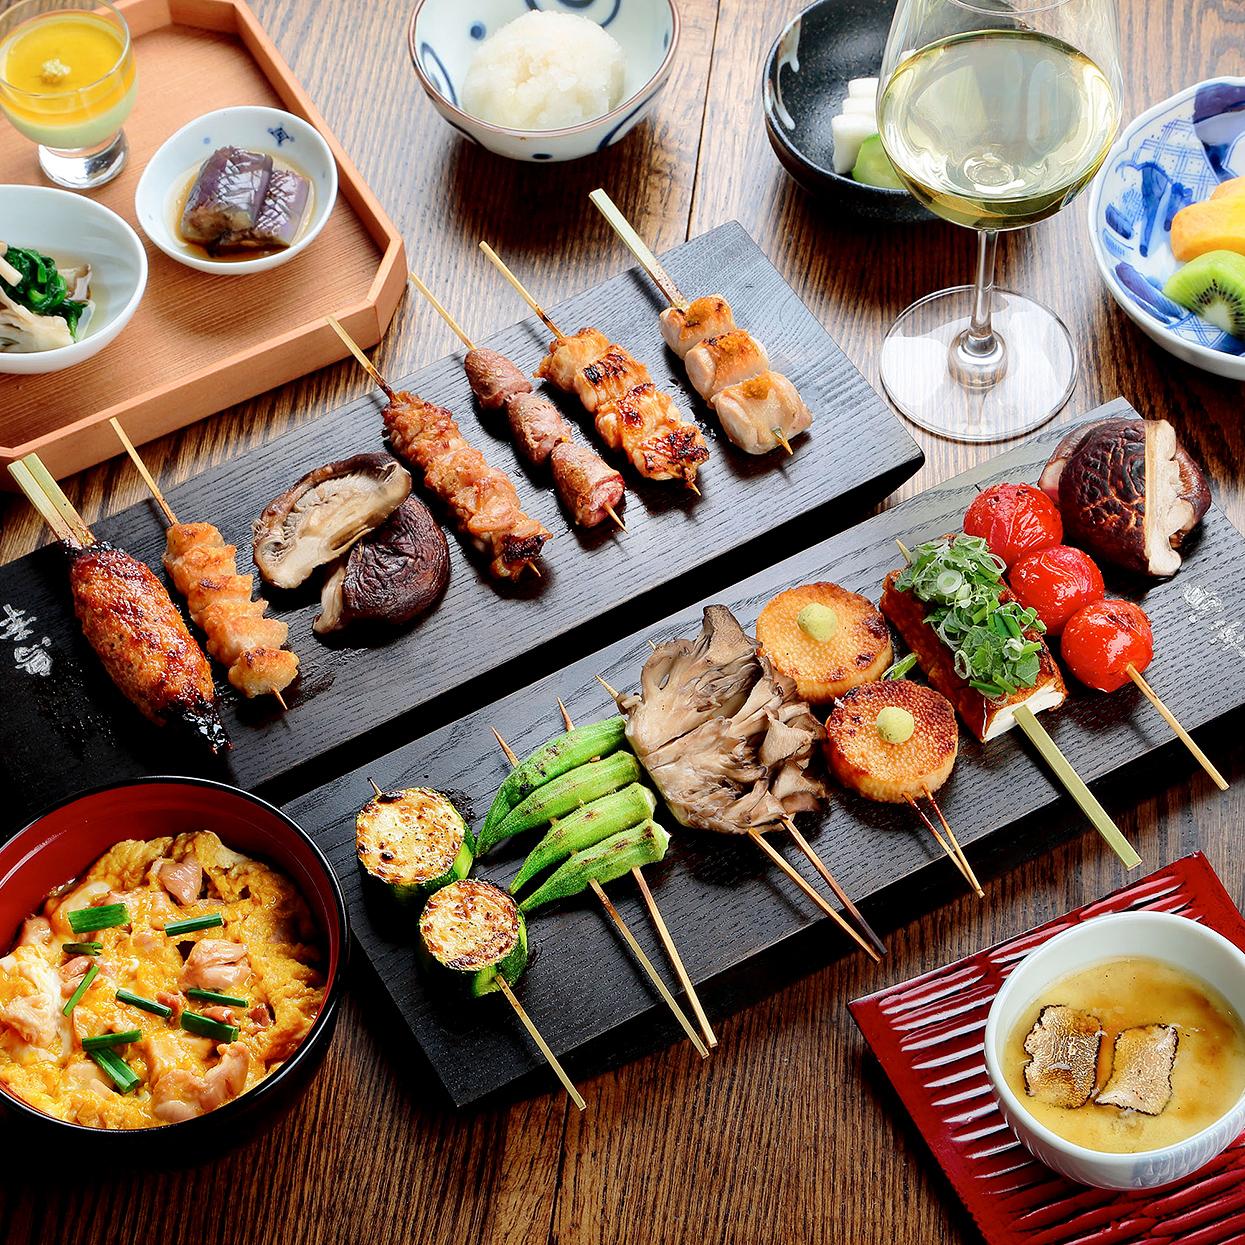 Toriko NY spread with kushiyaki skewers